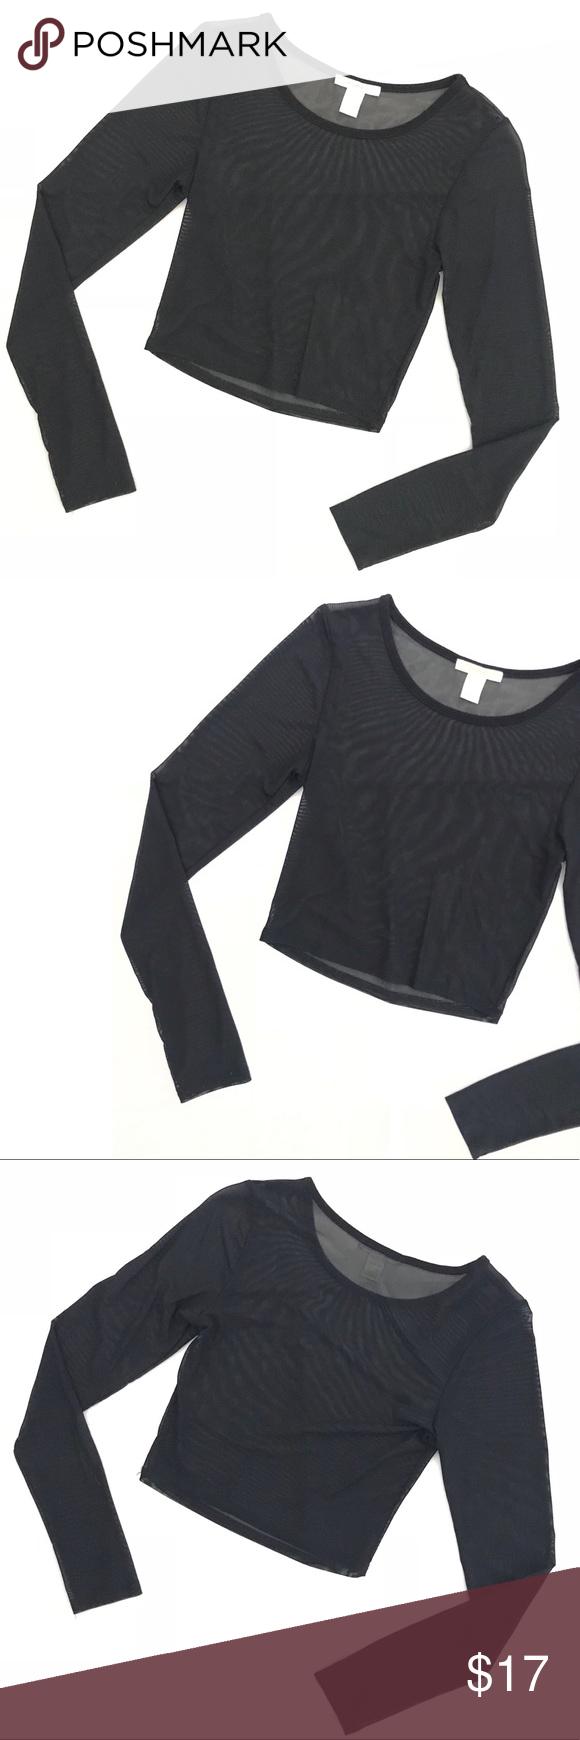 dd54a03acb112f Black Sheer Crop Top Long Sleeve Mesh Bozzolo - Black Sheer Crop Top Long  Sleeve Mesh